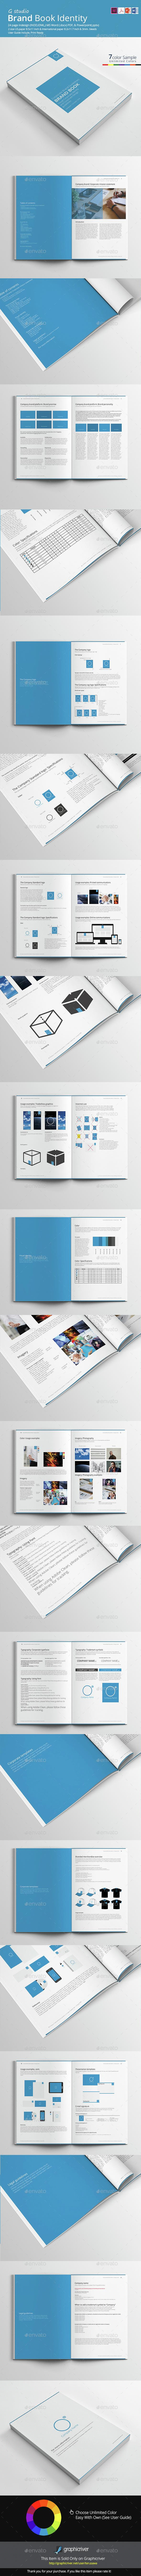 Brand Book Identity Template - Corporate Brochures